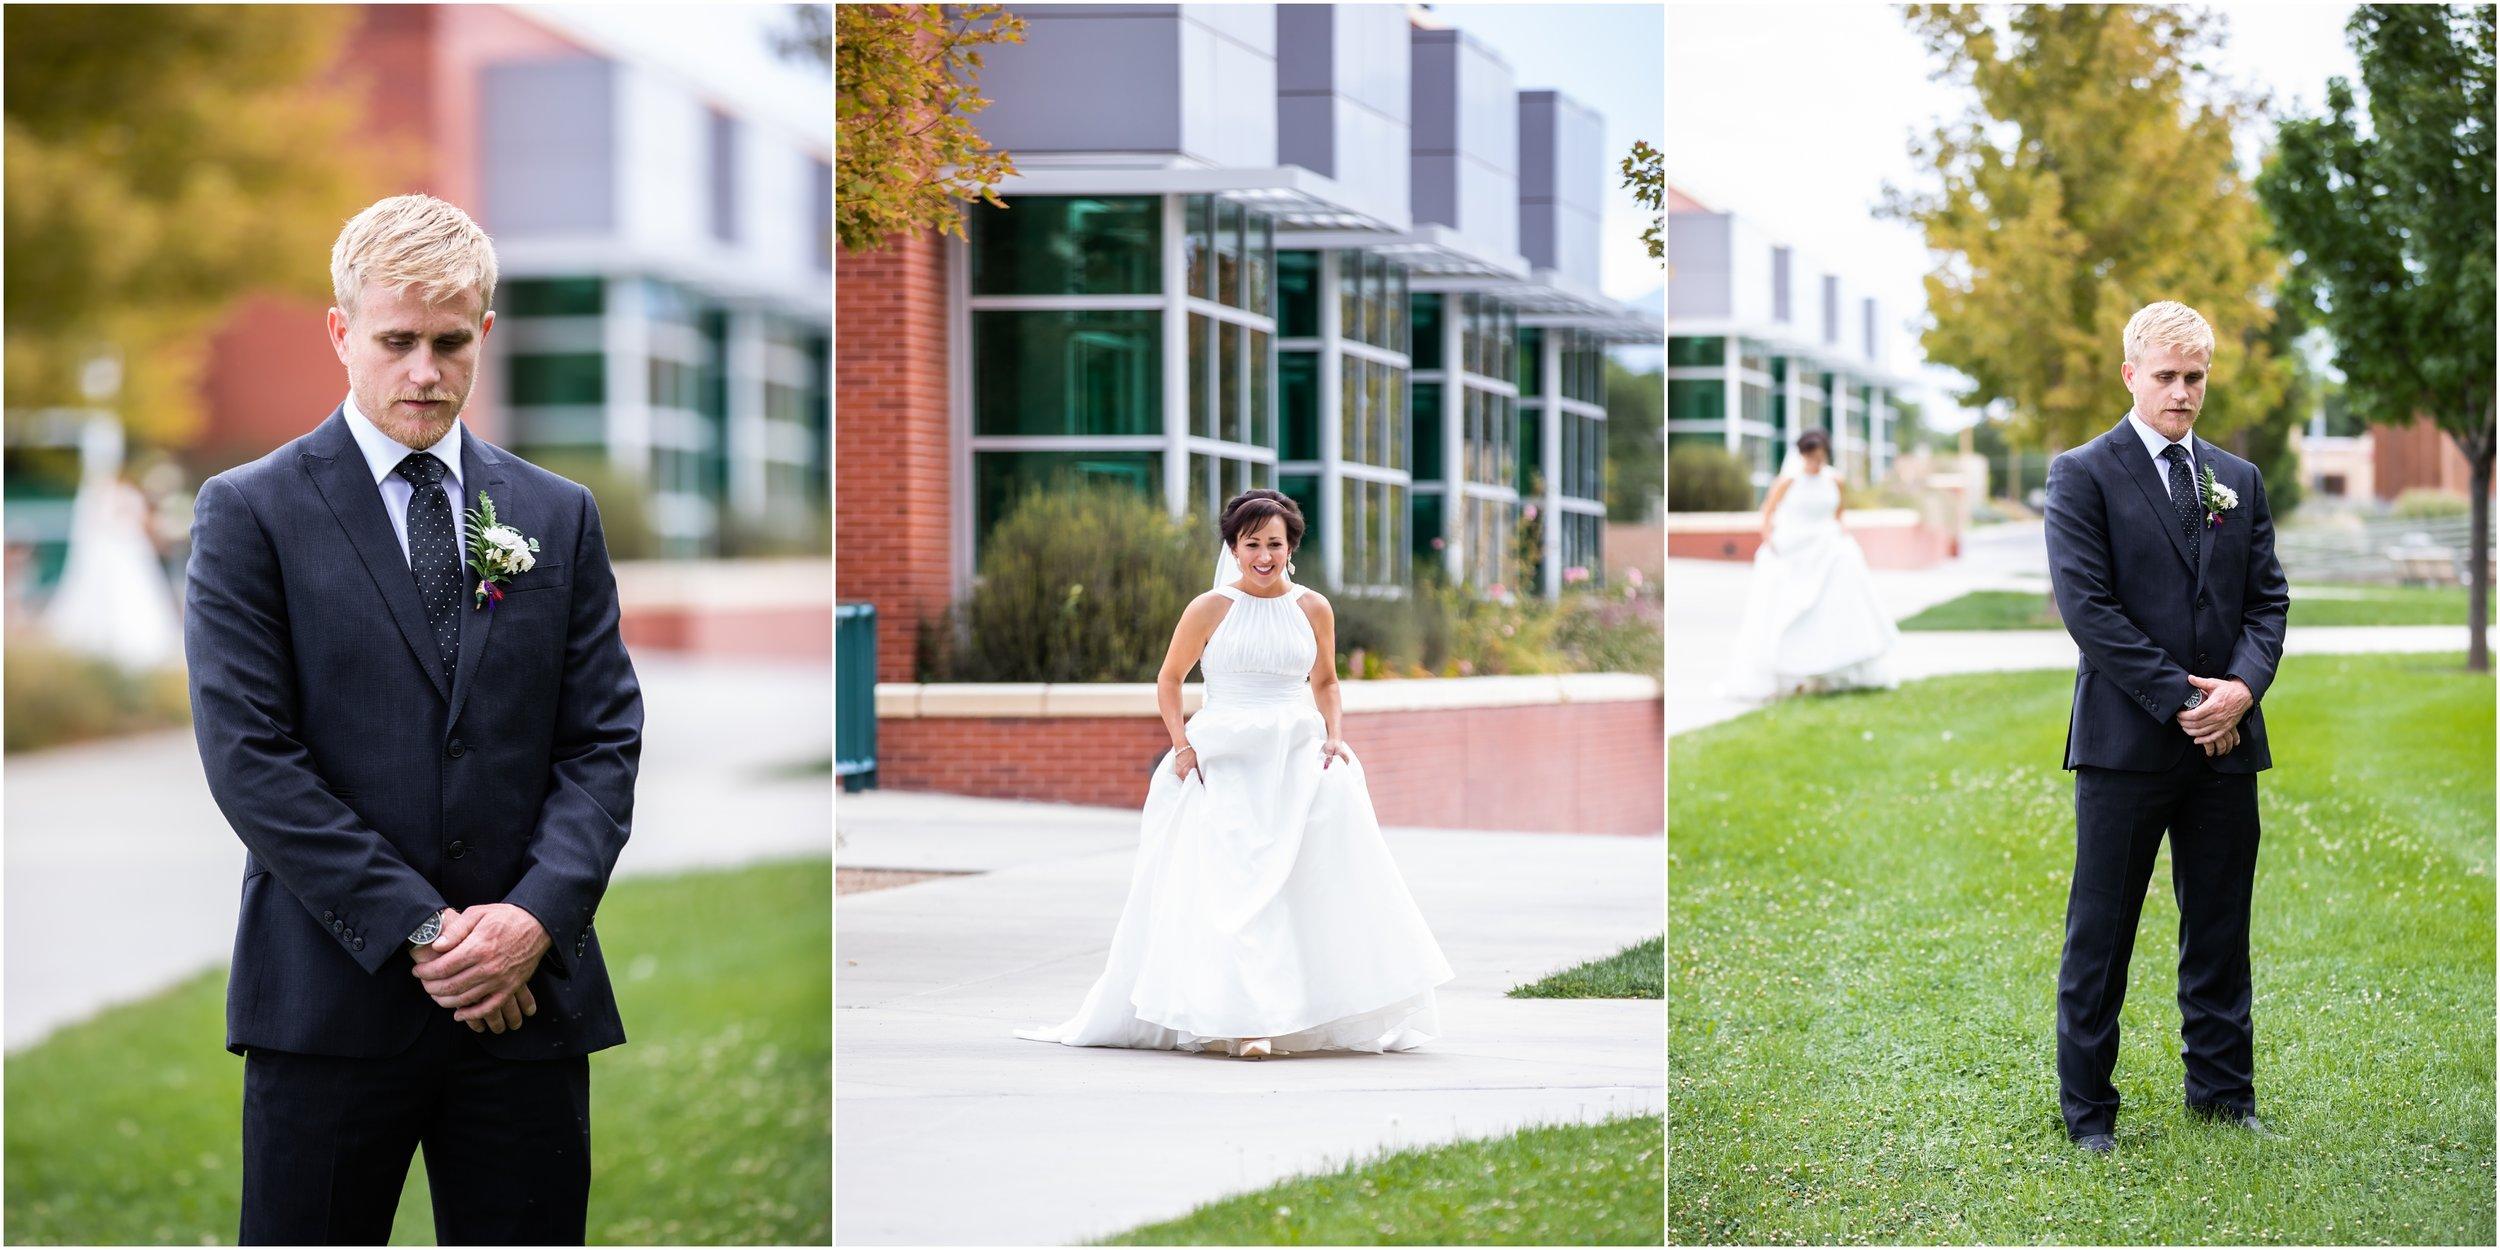 grand junction wedding photographer 10.jpg